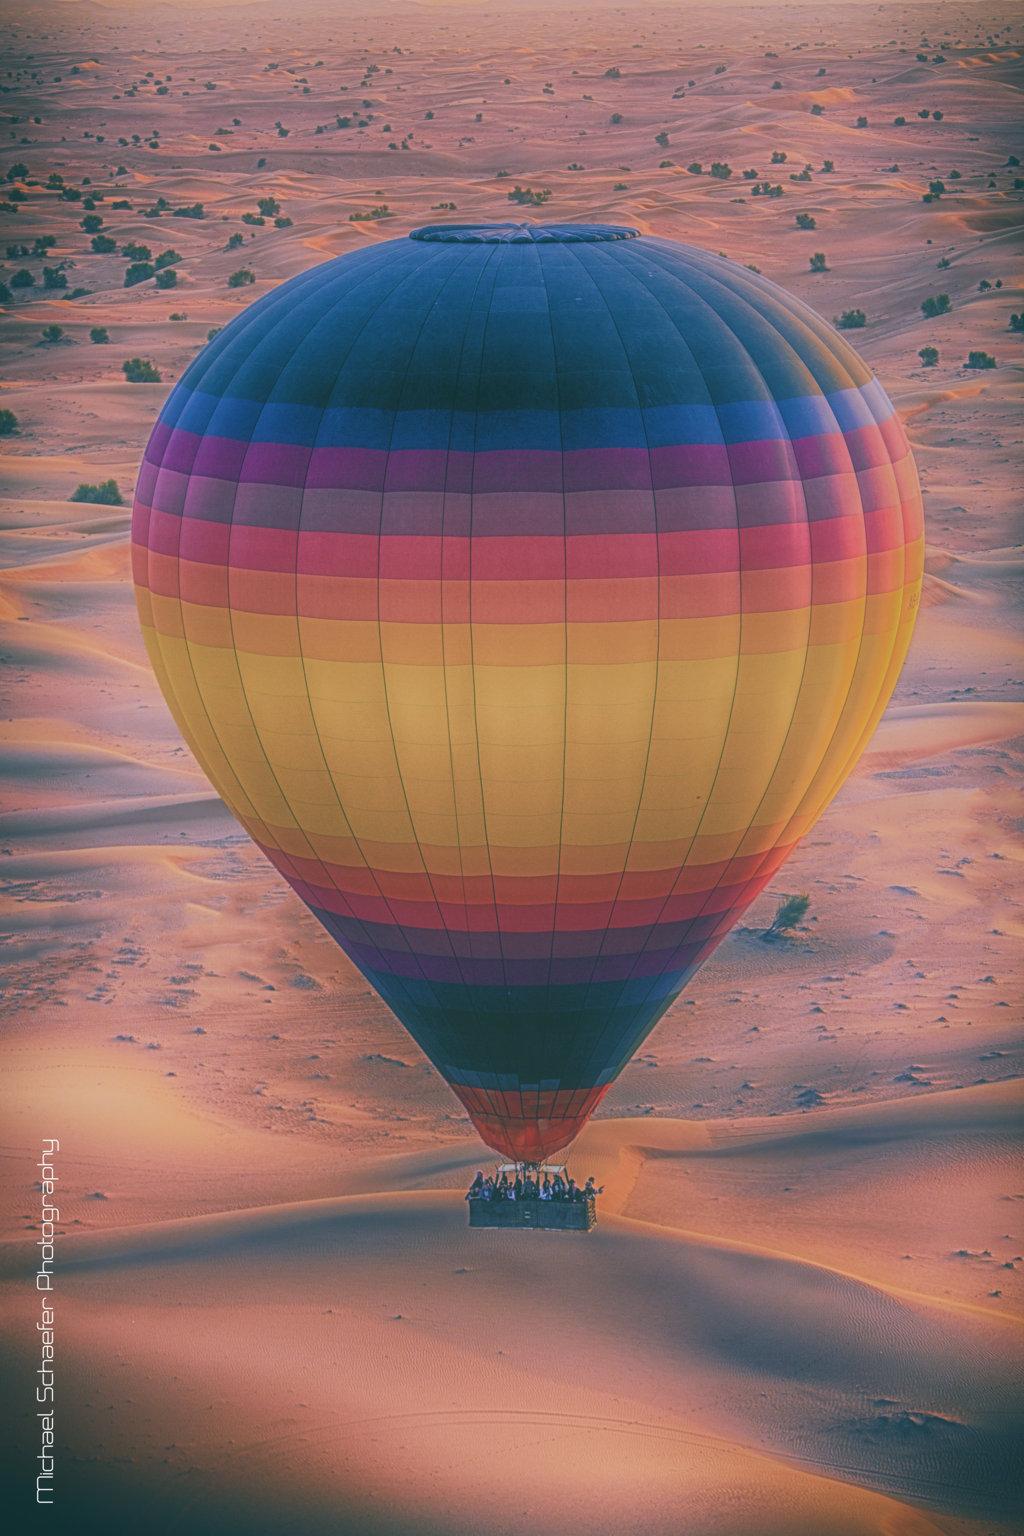 Hot-Air-Balloons-in-Dubai-FILEminimizer.jpg